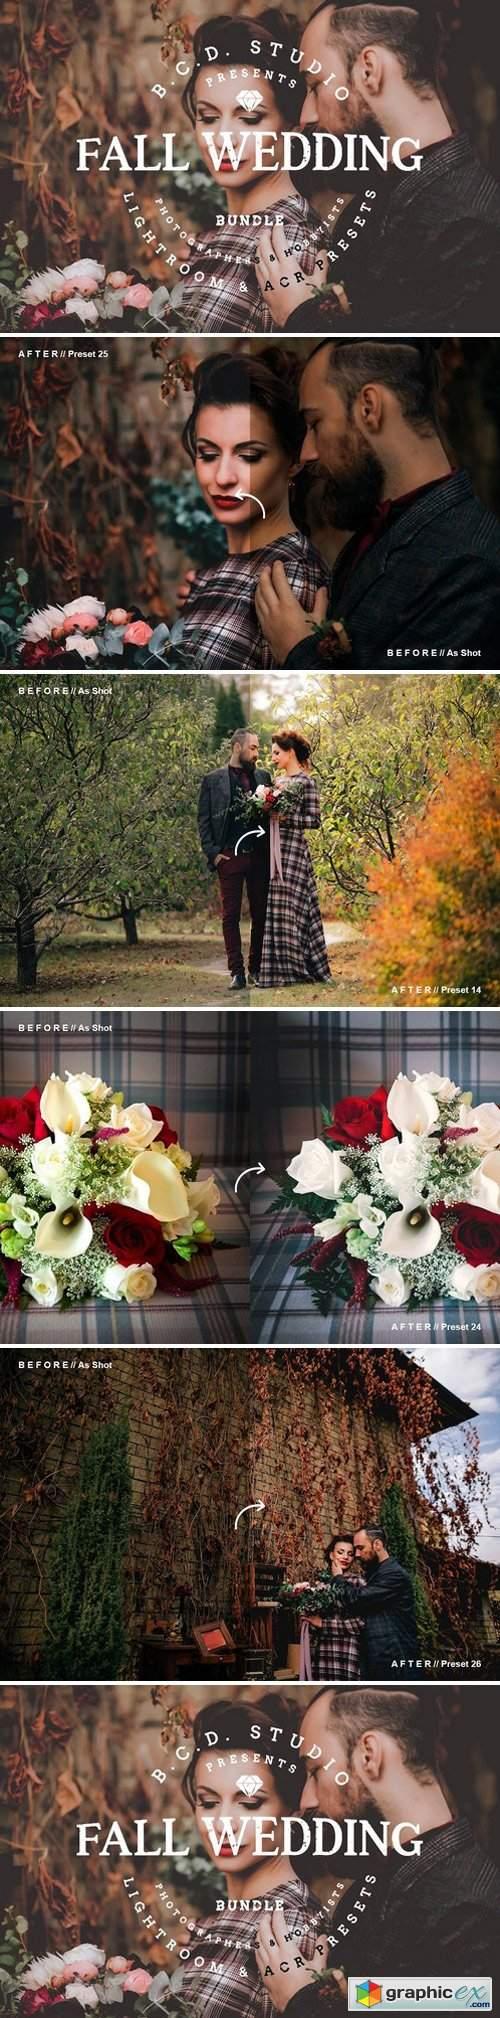 30 Fall Wedding LR PS Presets